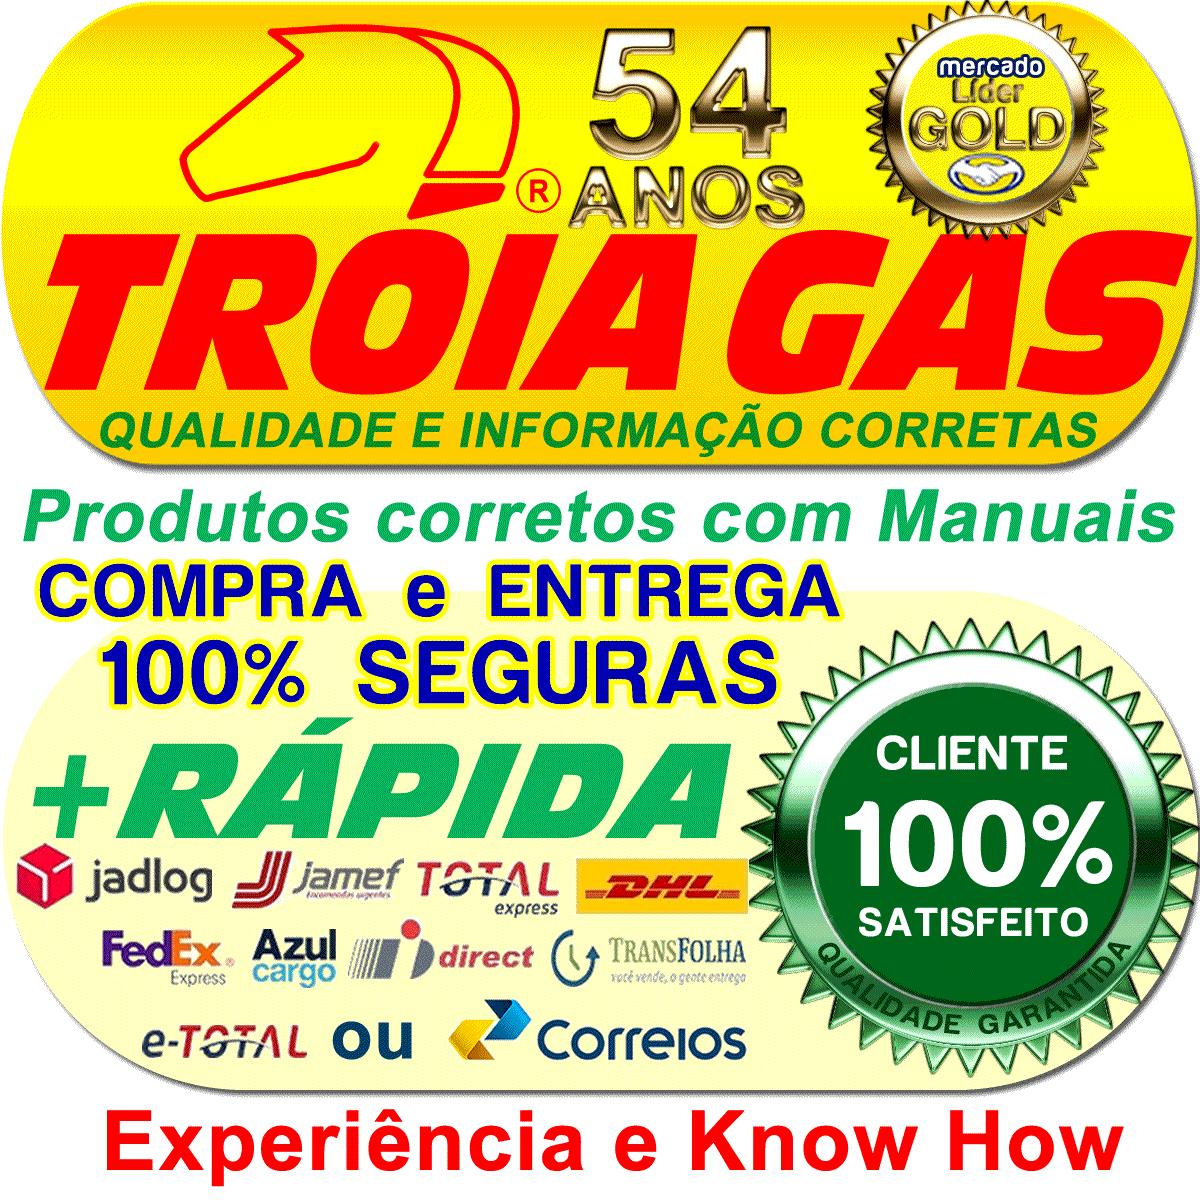 Simulador de Sonda Lambda Novo T634 = T63 + T64 TURY GAS